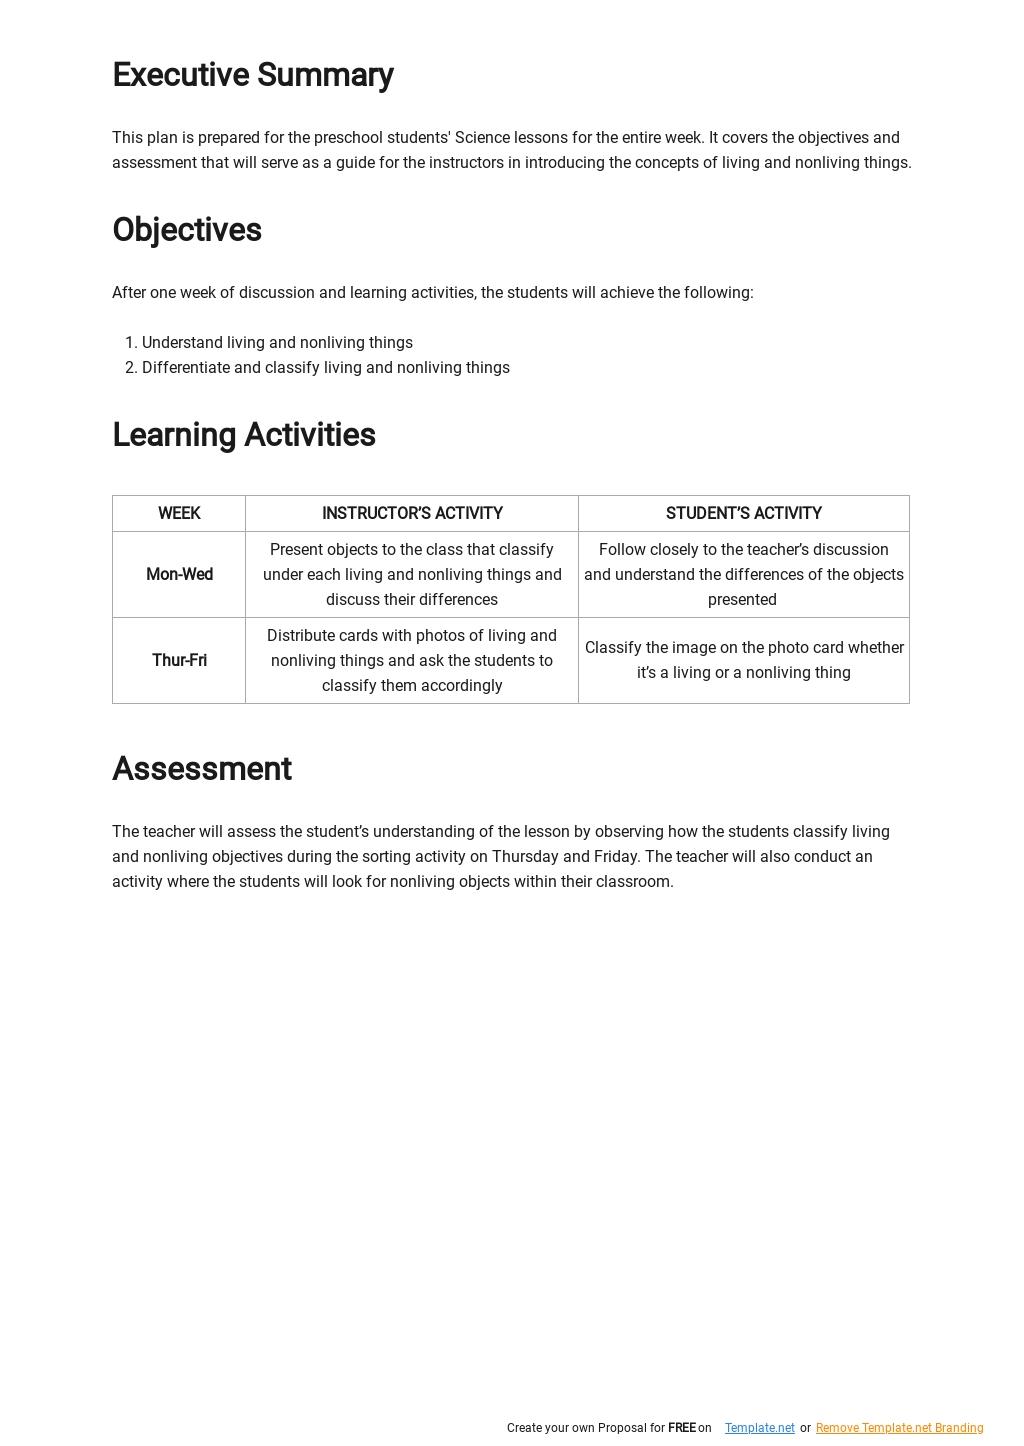 Free Blank Preschool Weekly Lesson Plan Template 1.jpe